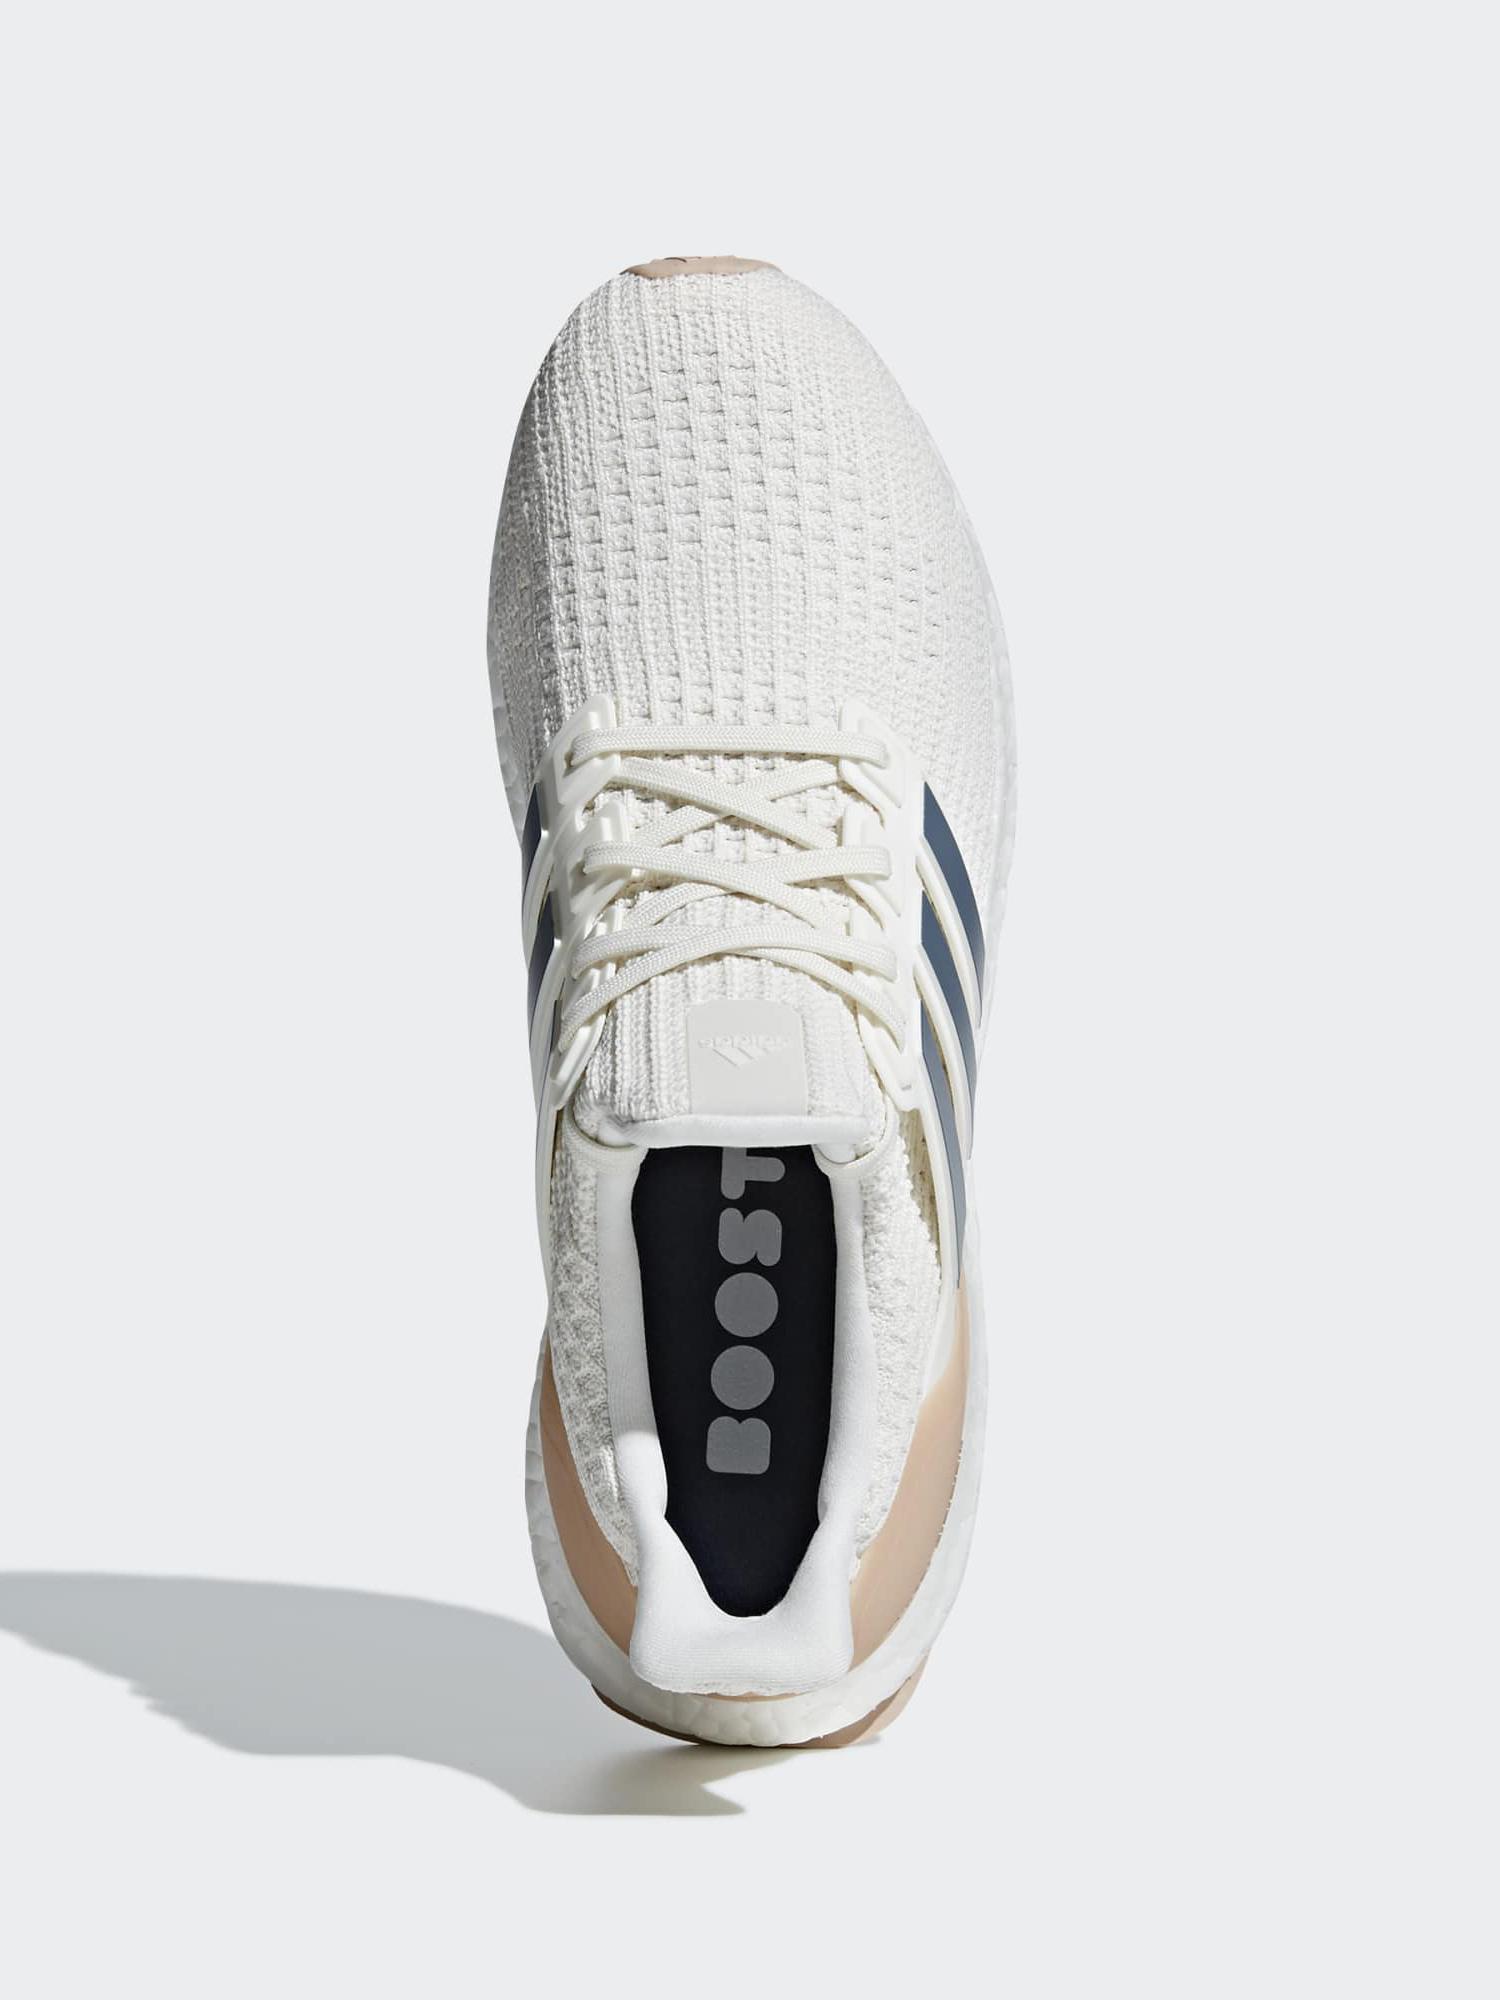 Adidas SportSchuhe LaufSchuhe LaufSchuhe LaufSchuhe Turnschuhe Running schuhe Trainers UltraBOOST m wei 3c2123